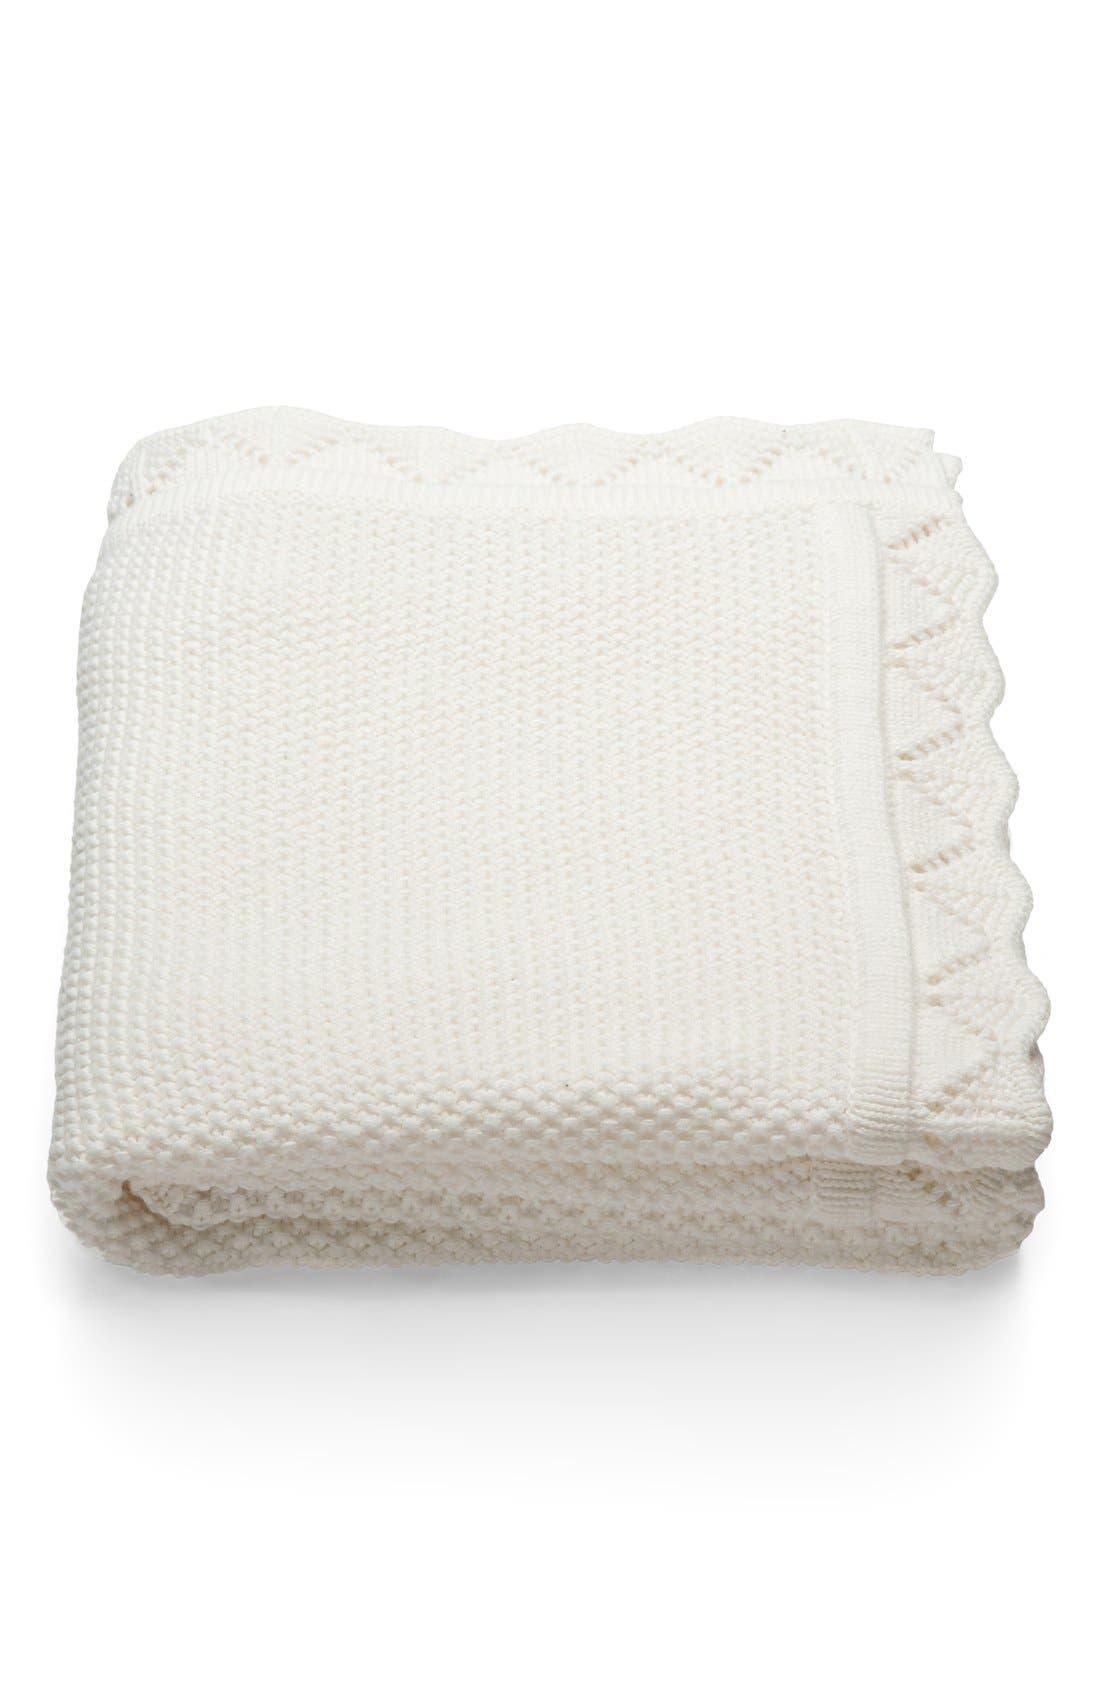 Main Image - Stokke 'Classic' Baby Blanket